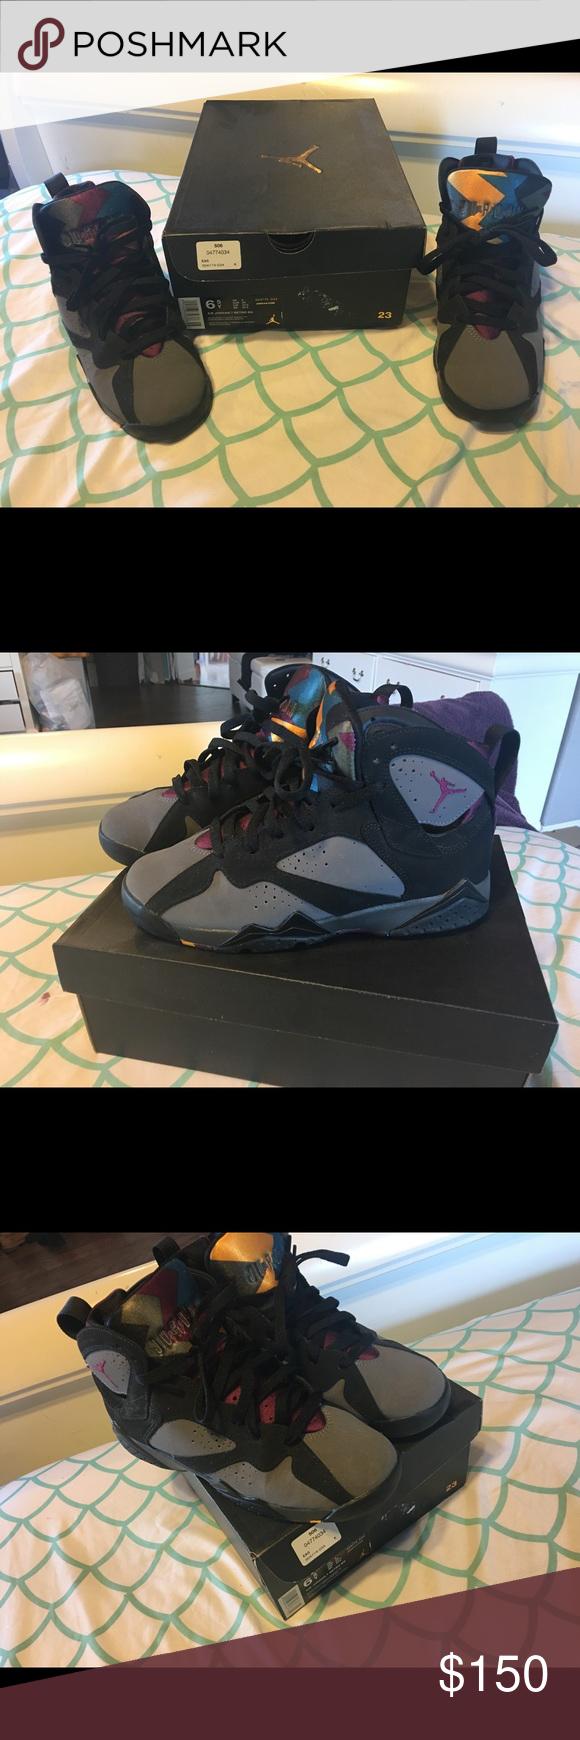 promo code f3795 6a938 Air Jordan 7 retro BG Color way  Black Brdx-Lt  Graphite-midnight Fg Noir   Borde-A-Mdntfg Jordan Shoes Sneakers